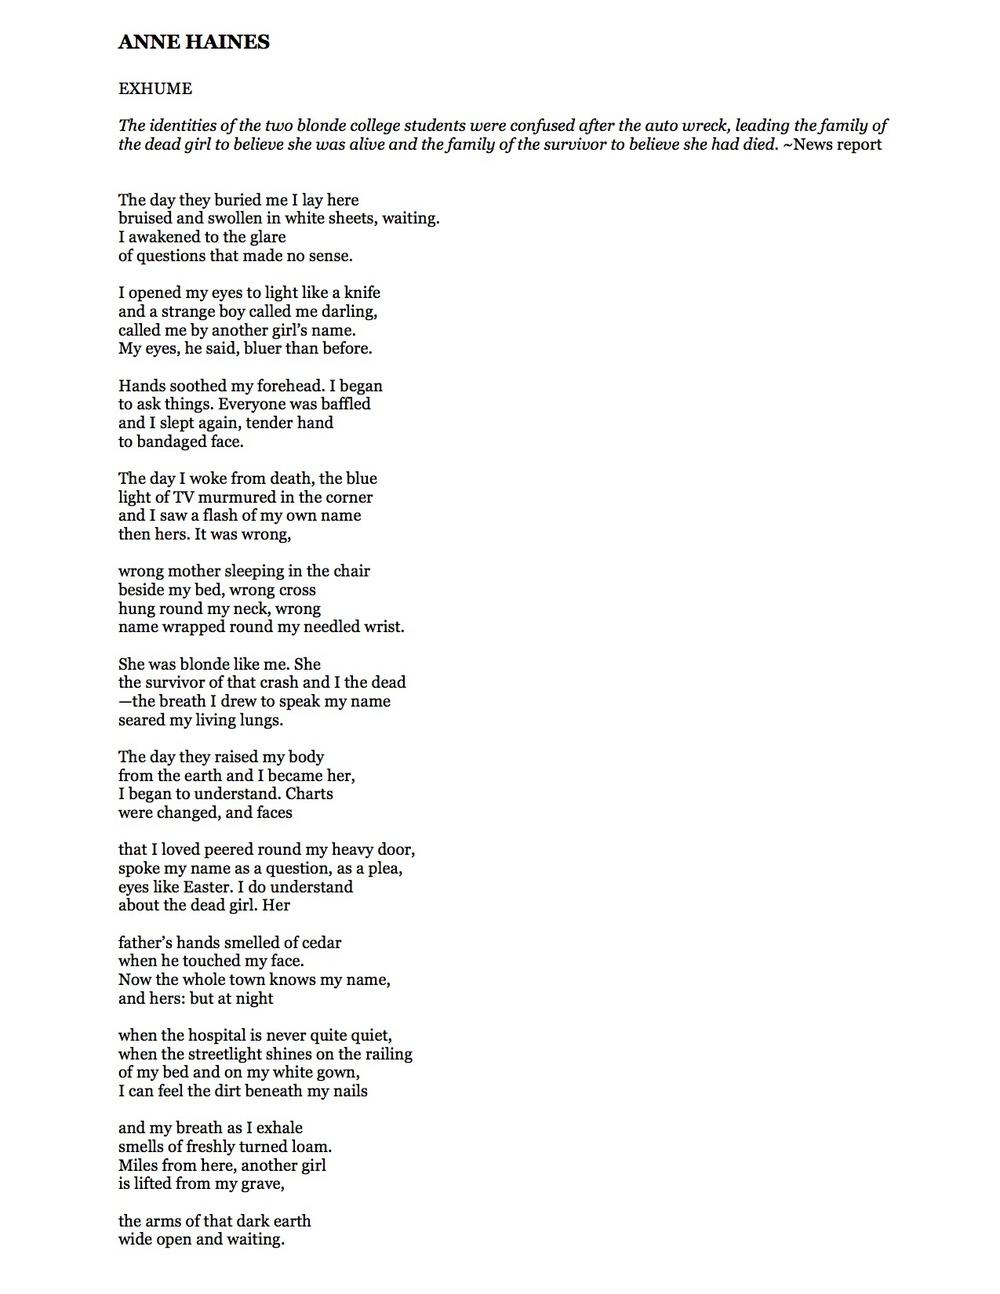 ANNE HAINES Exume poem.jpg